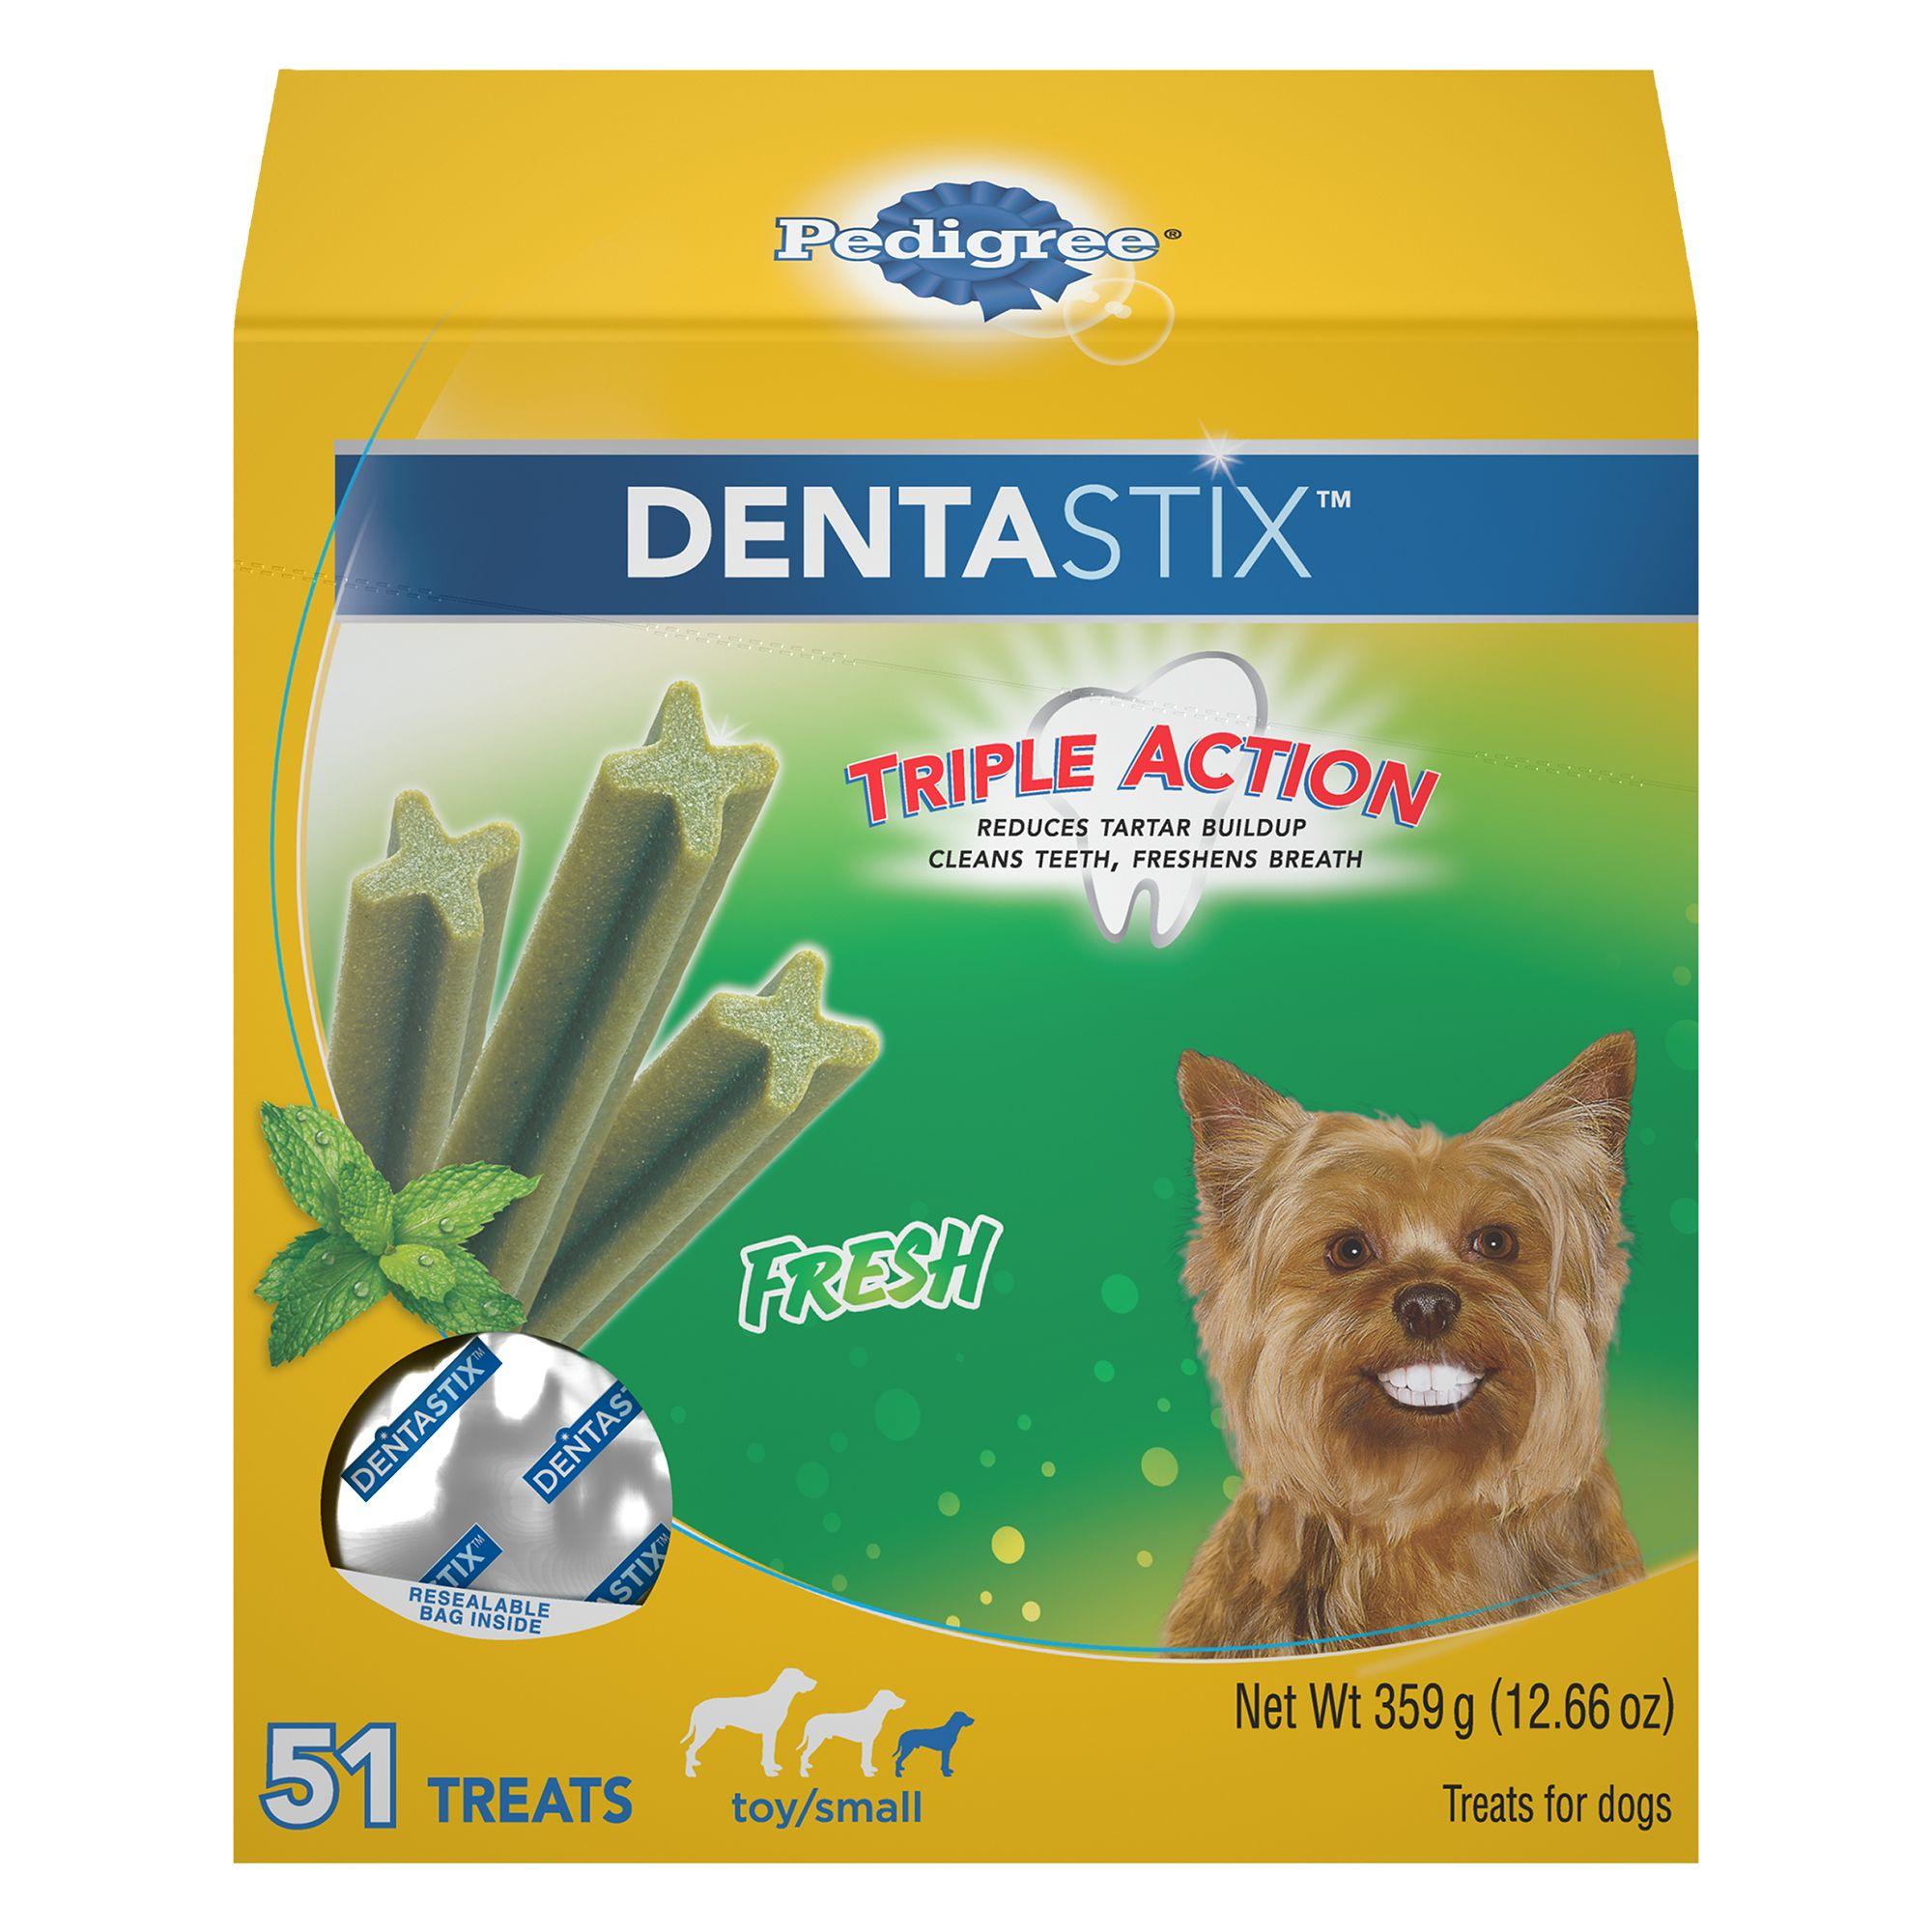 Pedigree® Dentastix® Triple Action Small Dog Treat - Fresh size: 51 Count 5249695